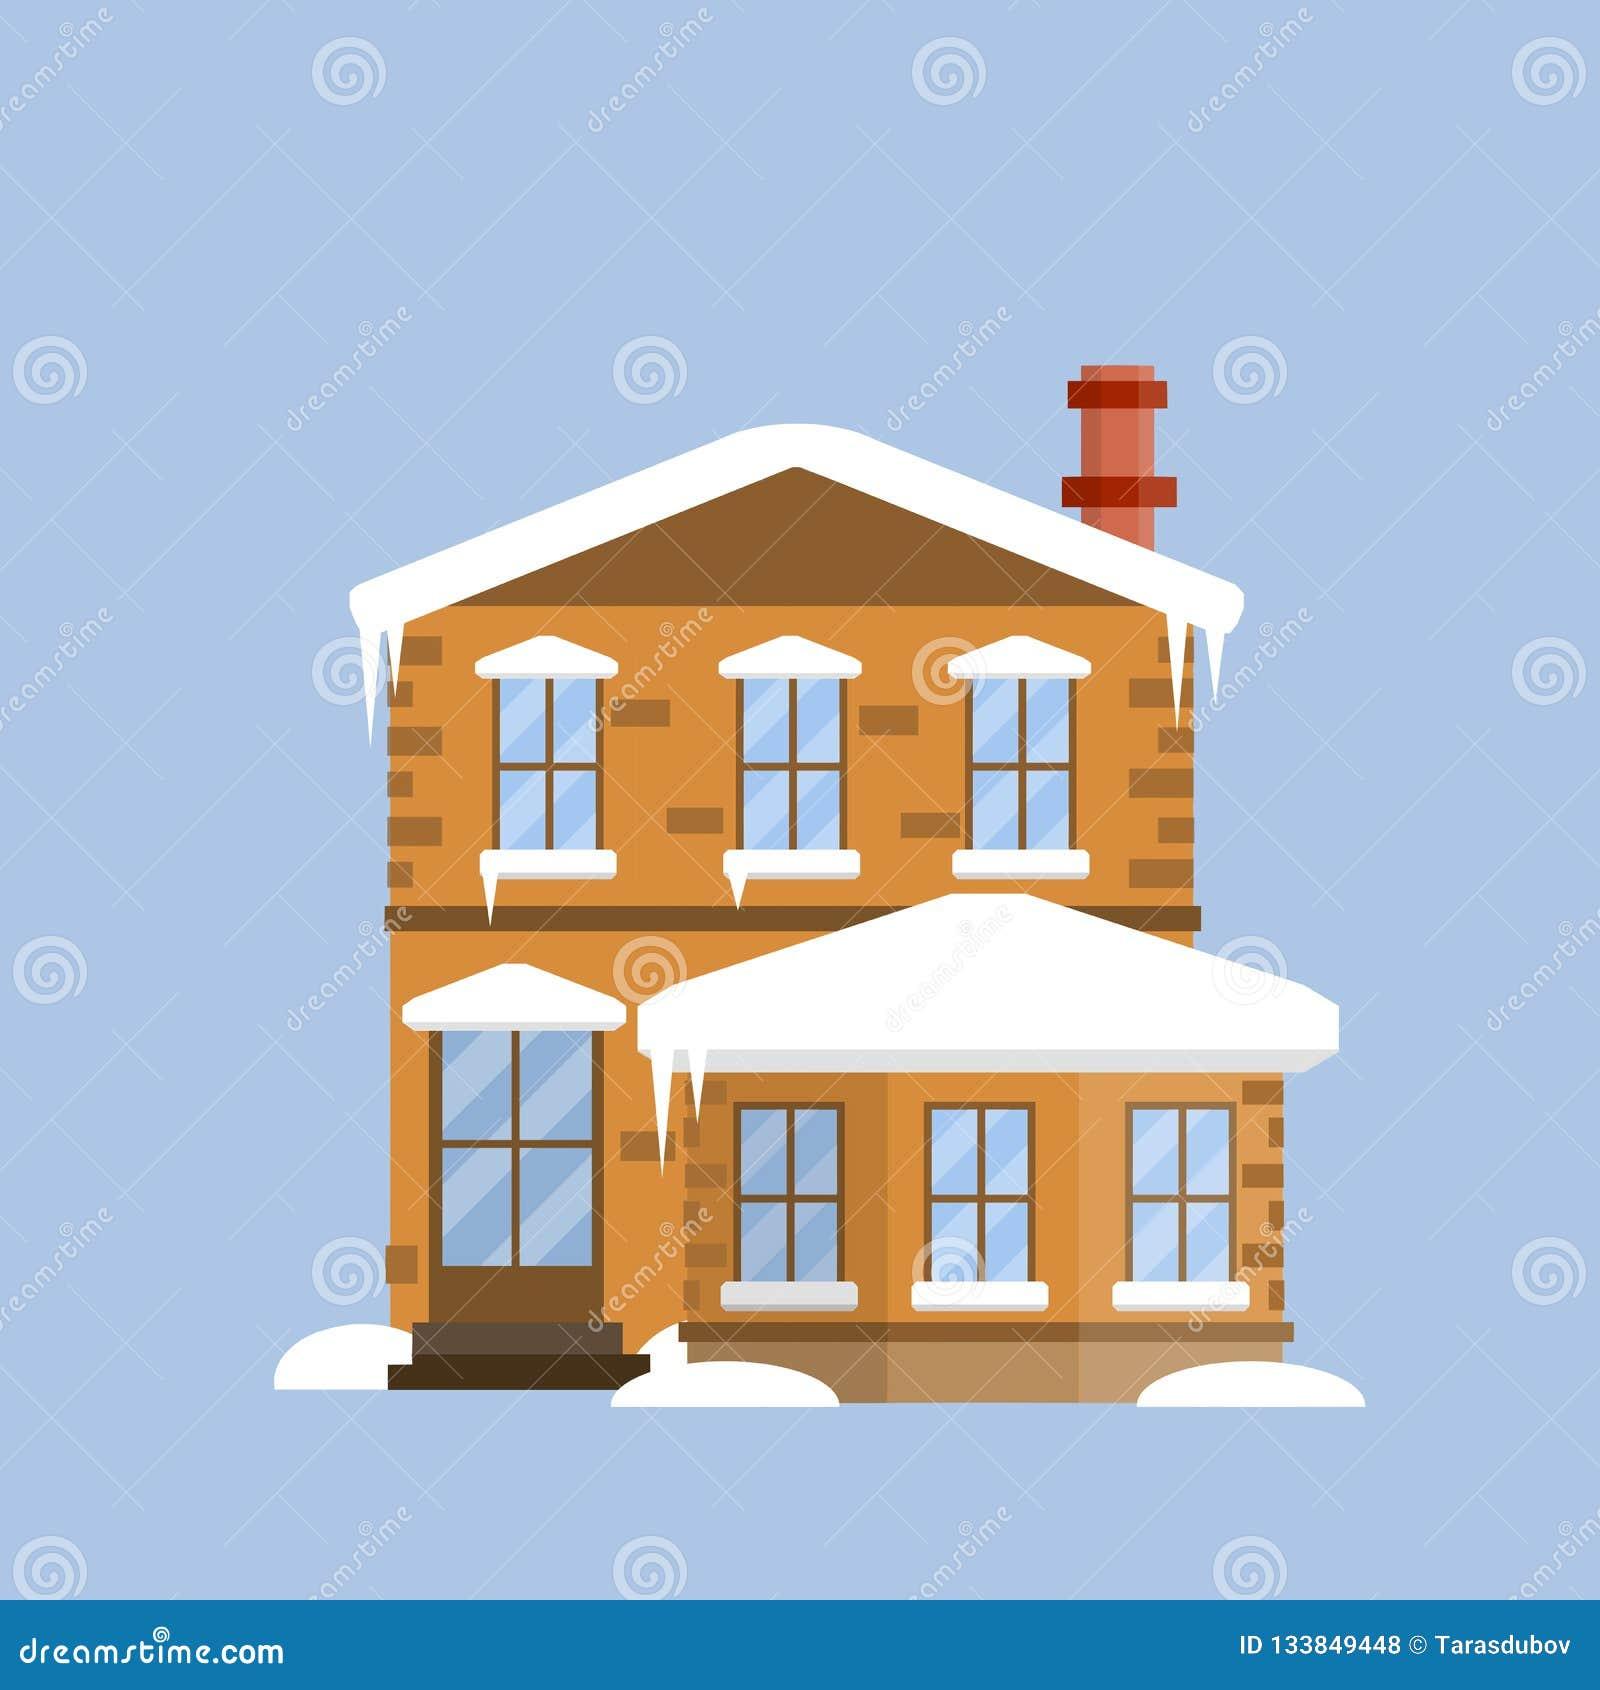 Marvelous Suburban Cozy Home Cartoon Flat Illustration Stock Download Free Architecture Designs Fluibritishbridgeorg